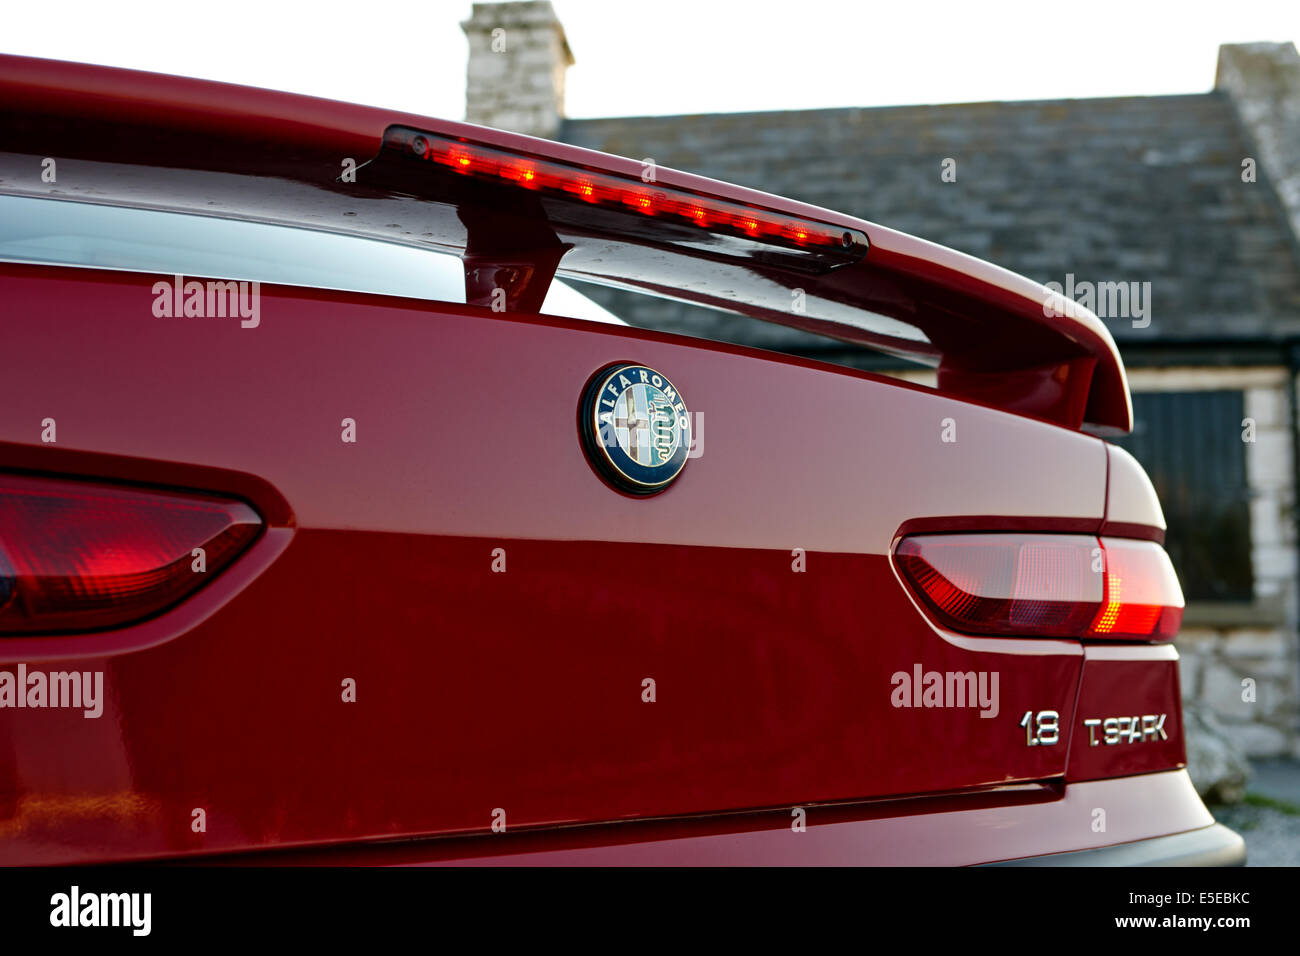 rear spoiler and high level brake light on rear of Alfa Romeo 156 - Stock Image